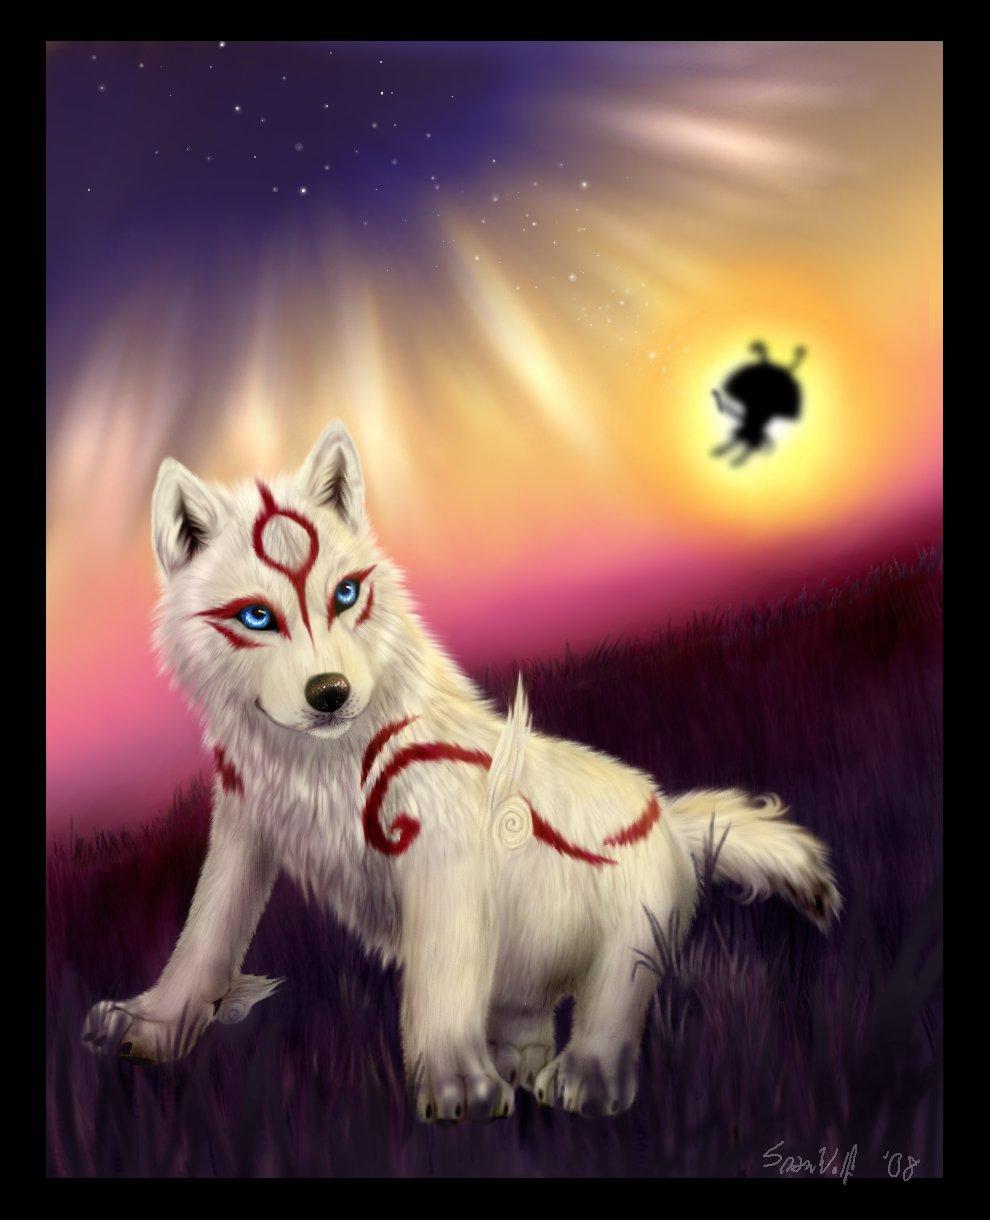 Sunfire the She-Wolf Okami___The_Sun_Rises_by_SnowWolfMystic